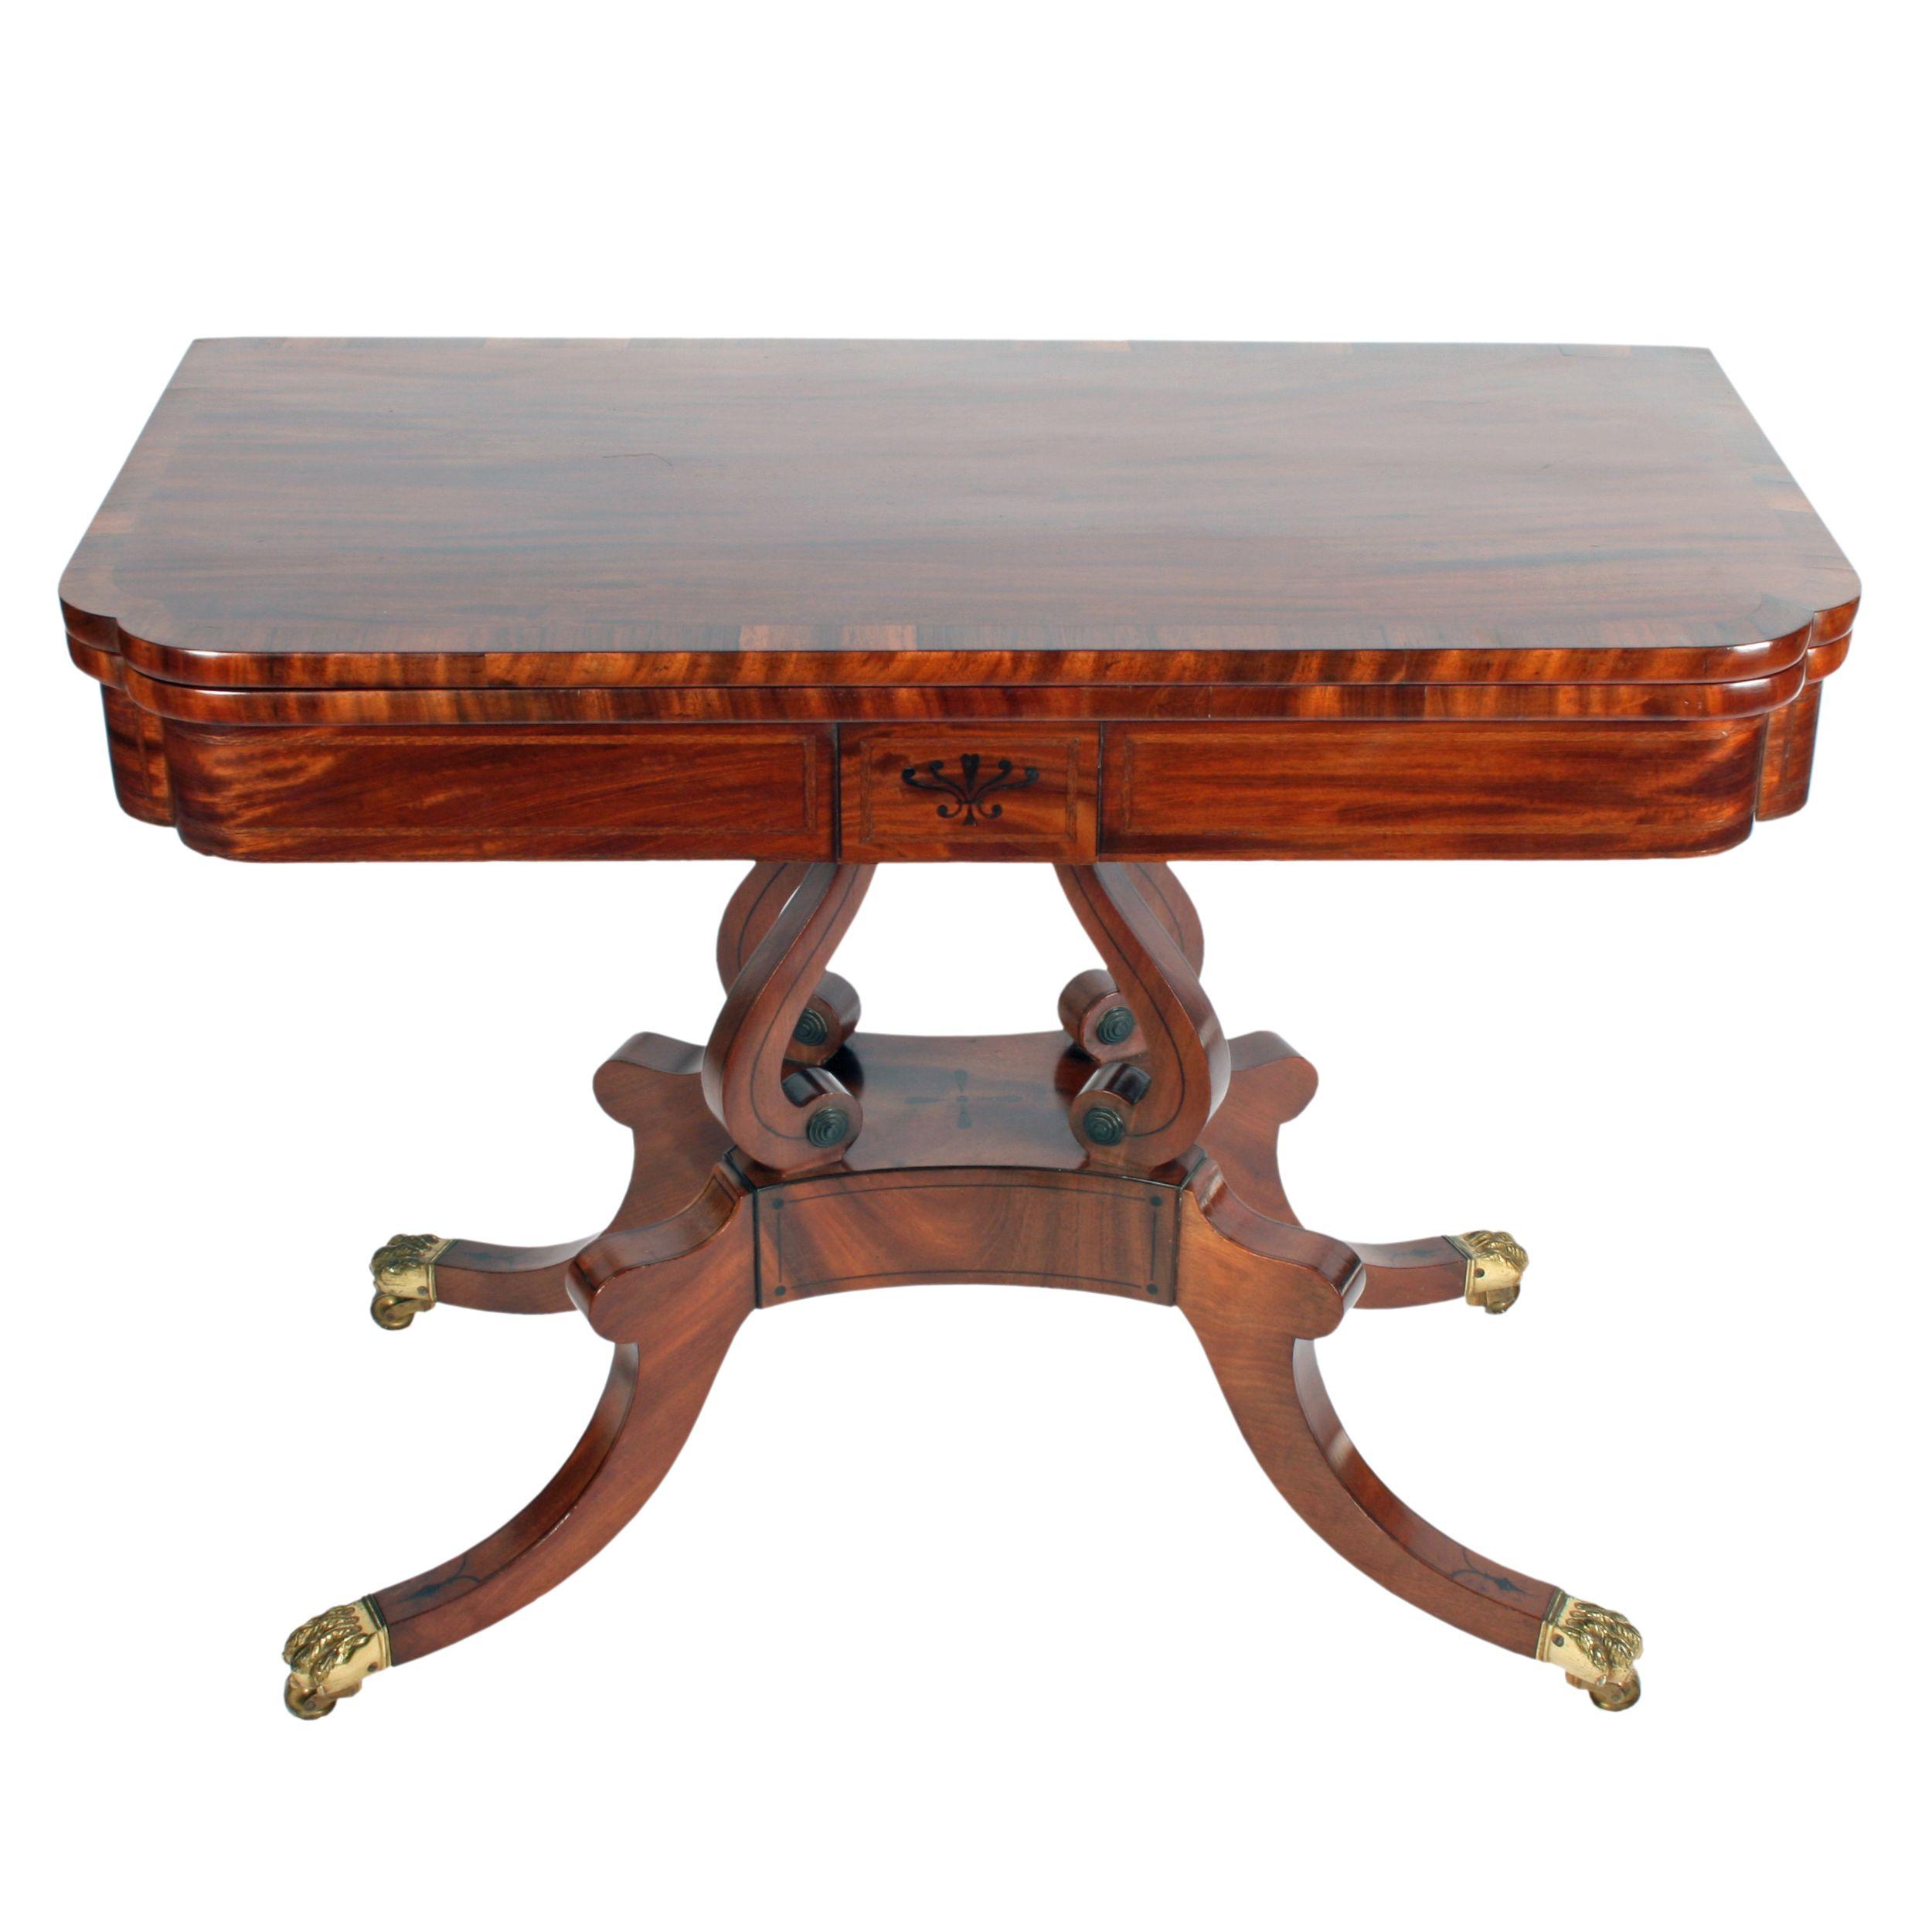 Antique regency mahogany tea table antique card tables uk antique - Regency Card Table Attributed To William Trotter C Tableantique